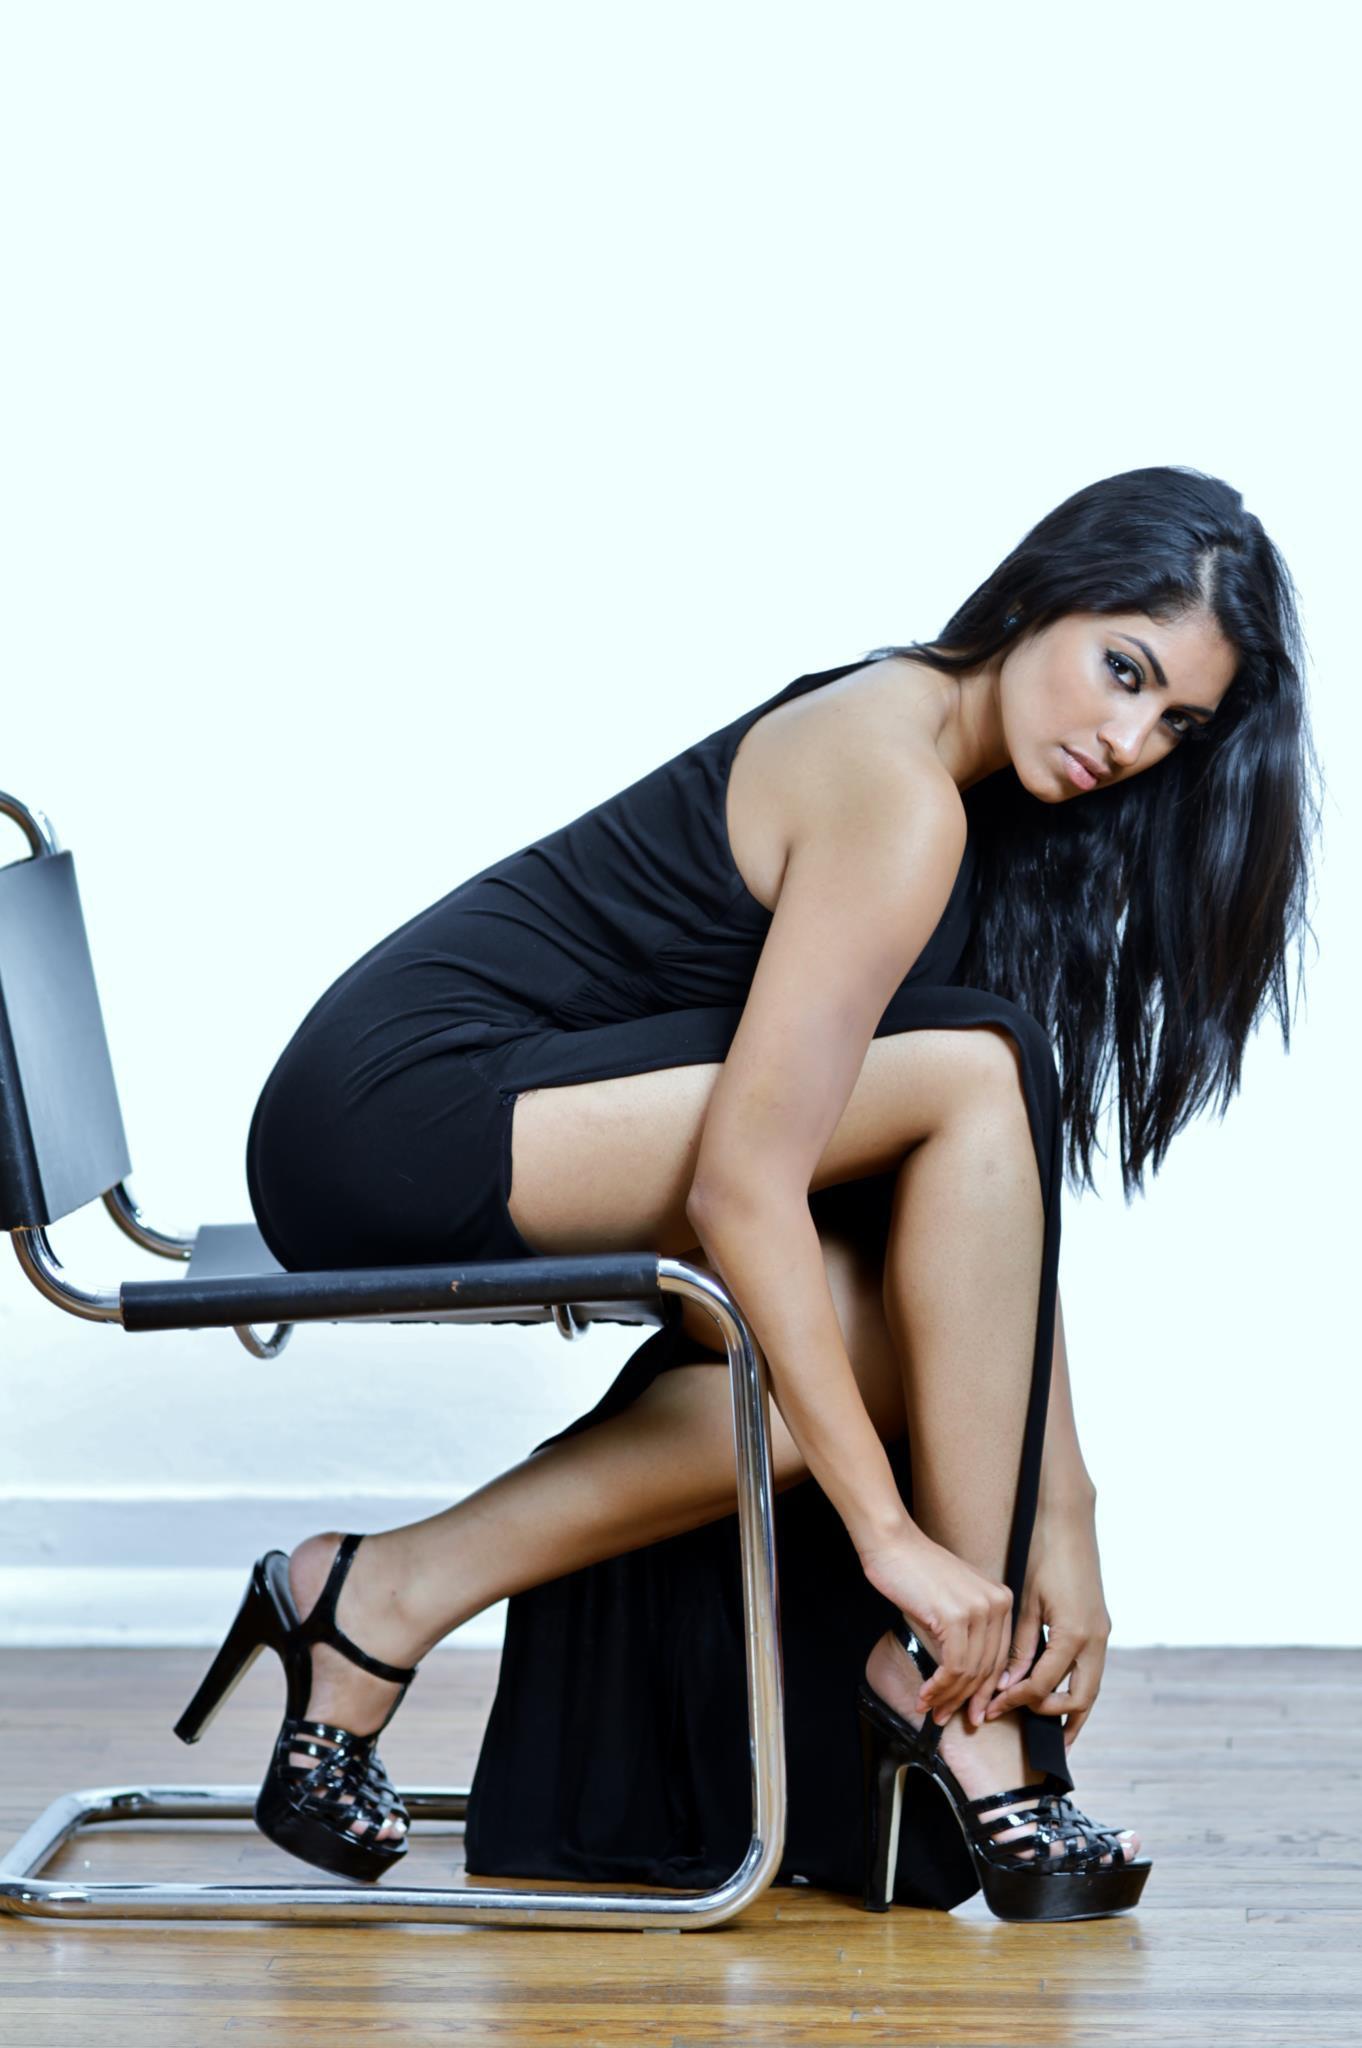 Gabrellia Lera's Model portfolio